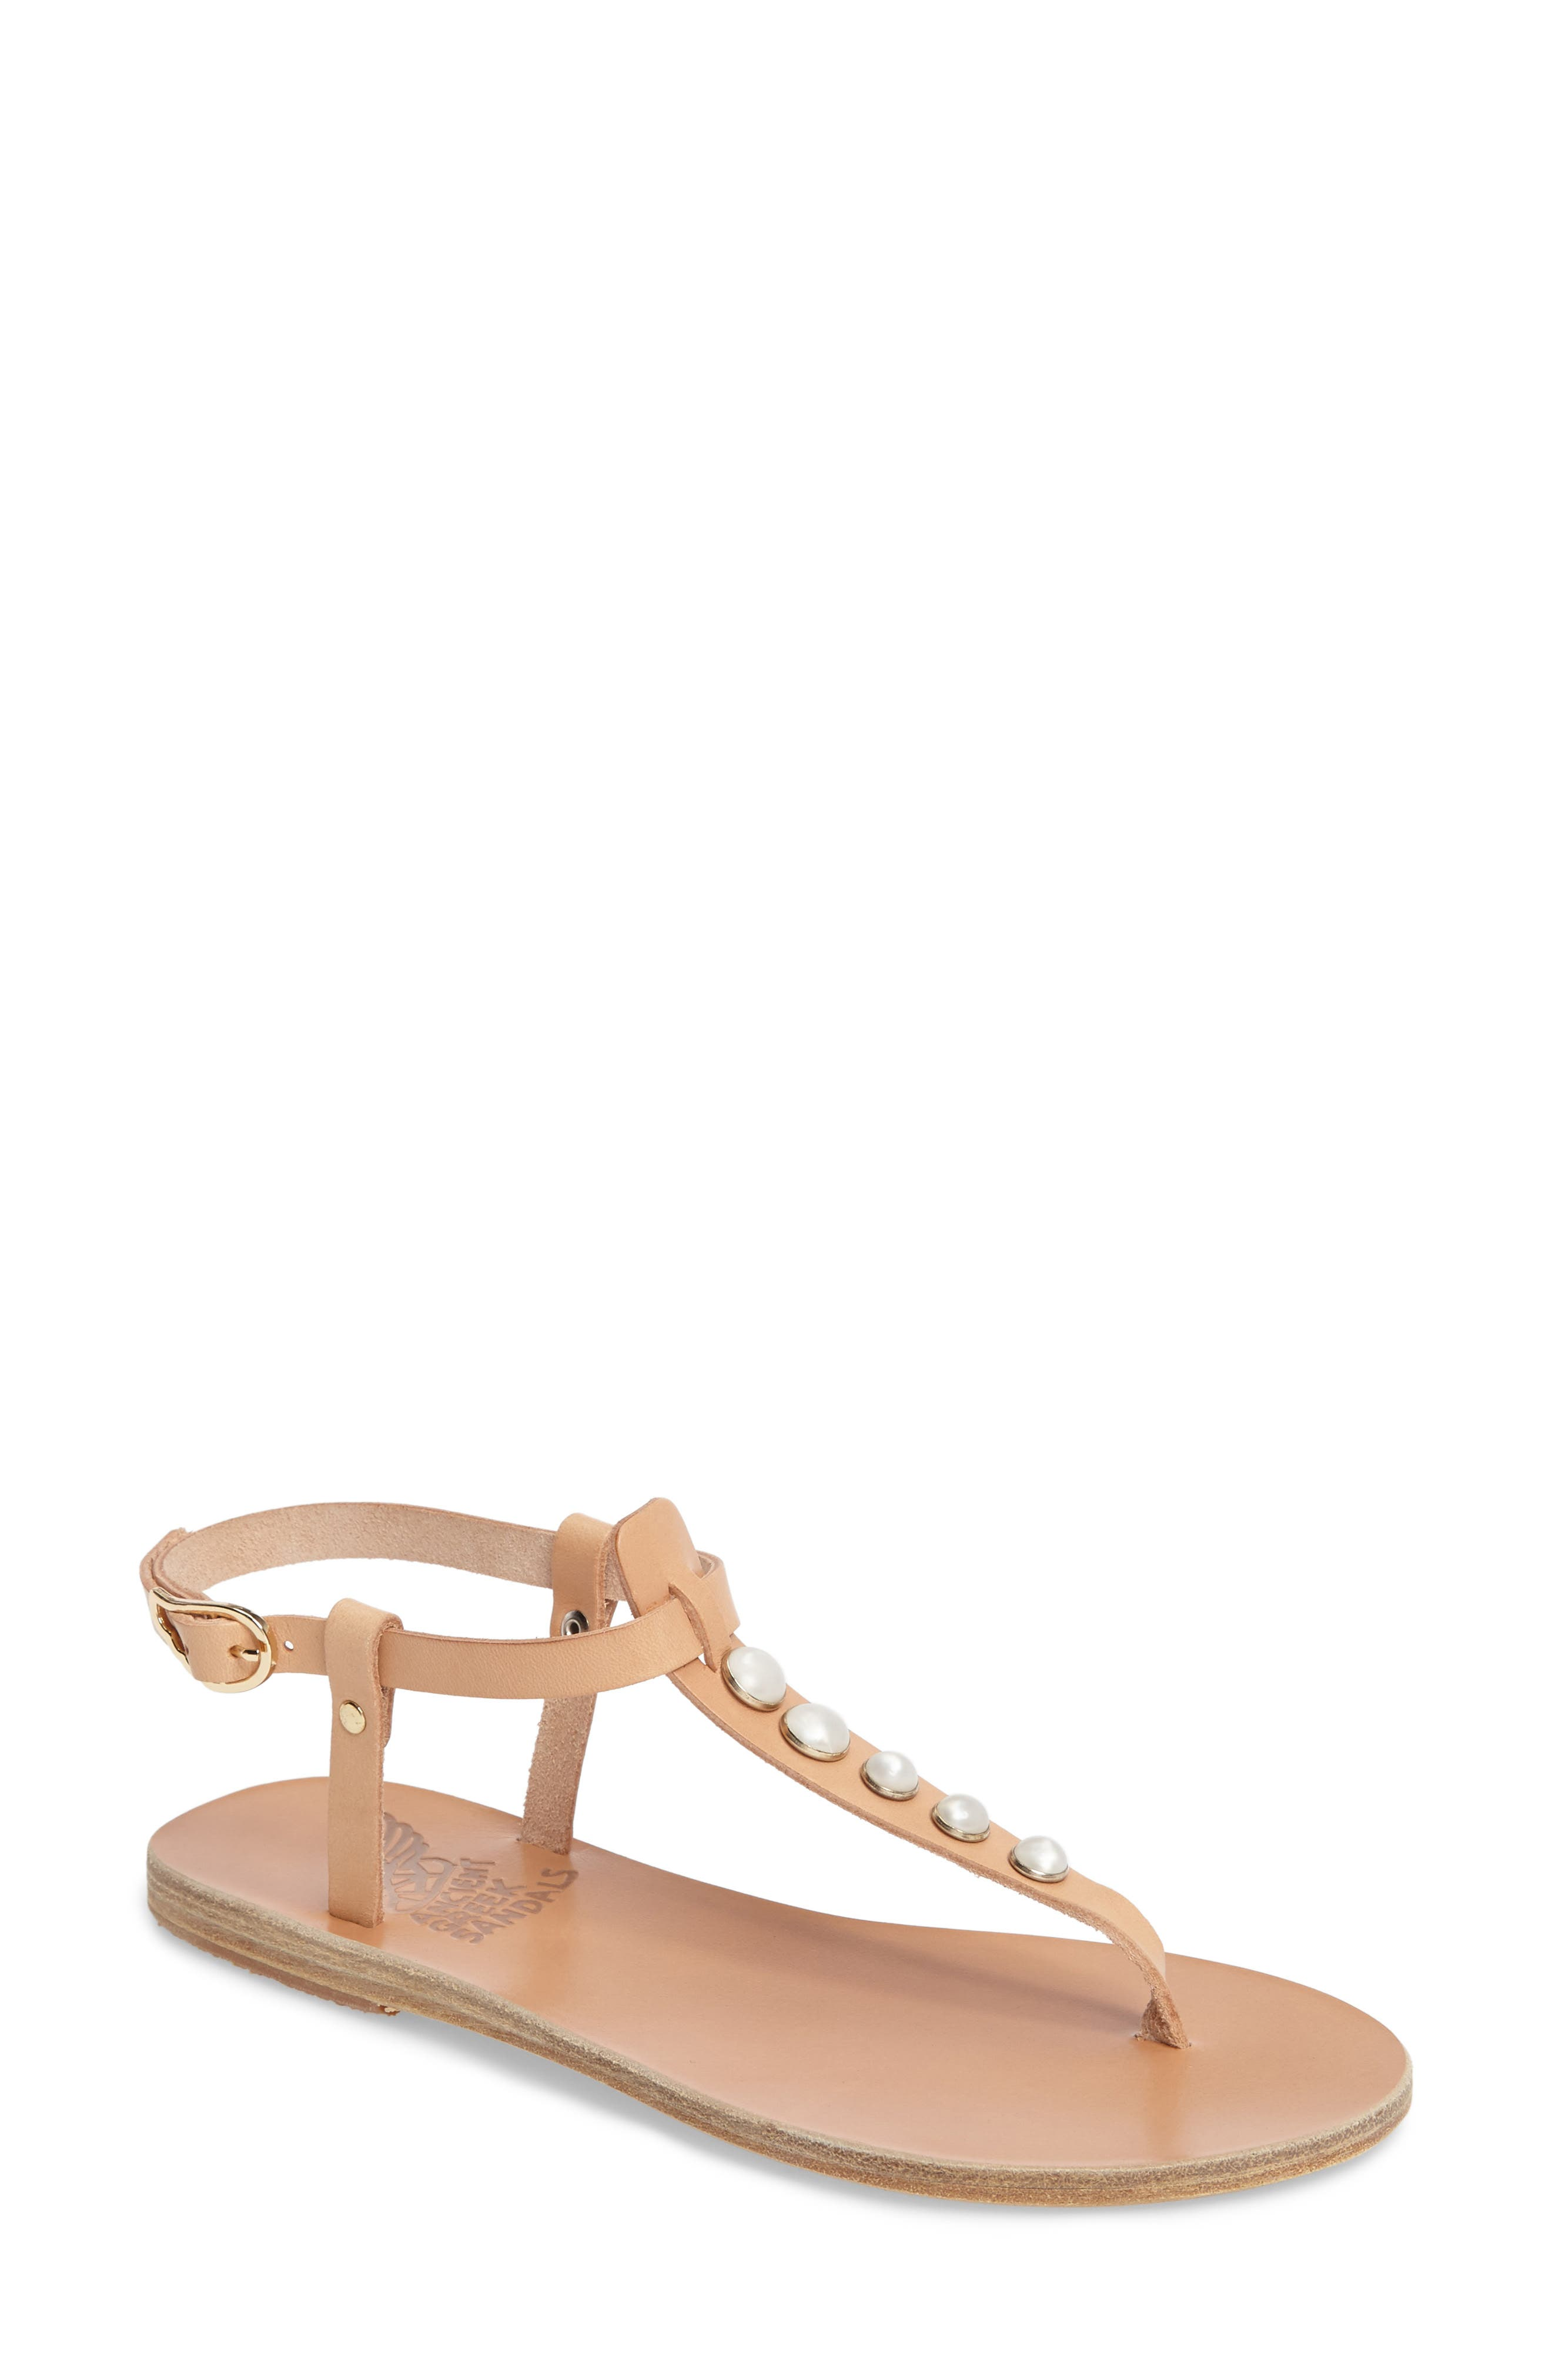 Lito Imitation Pearl Embellished T-Strap Sandal,                             Main thumbnail 1, color,                             Natural Vachetta